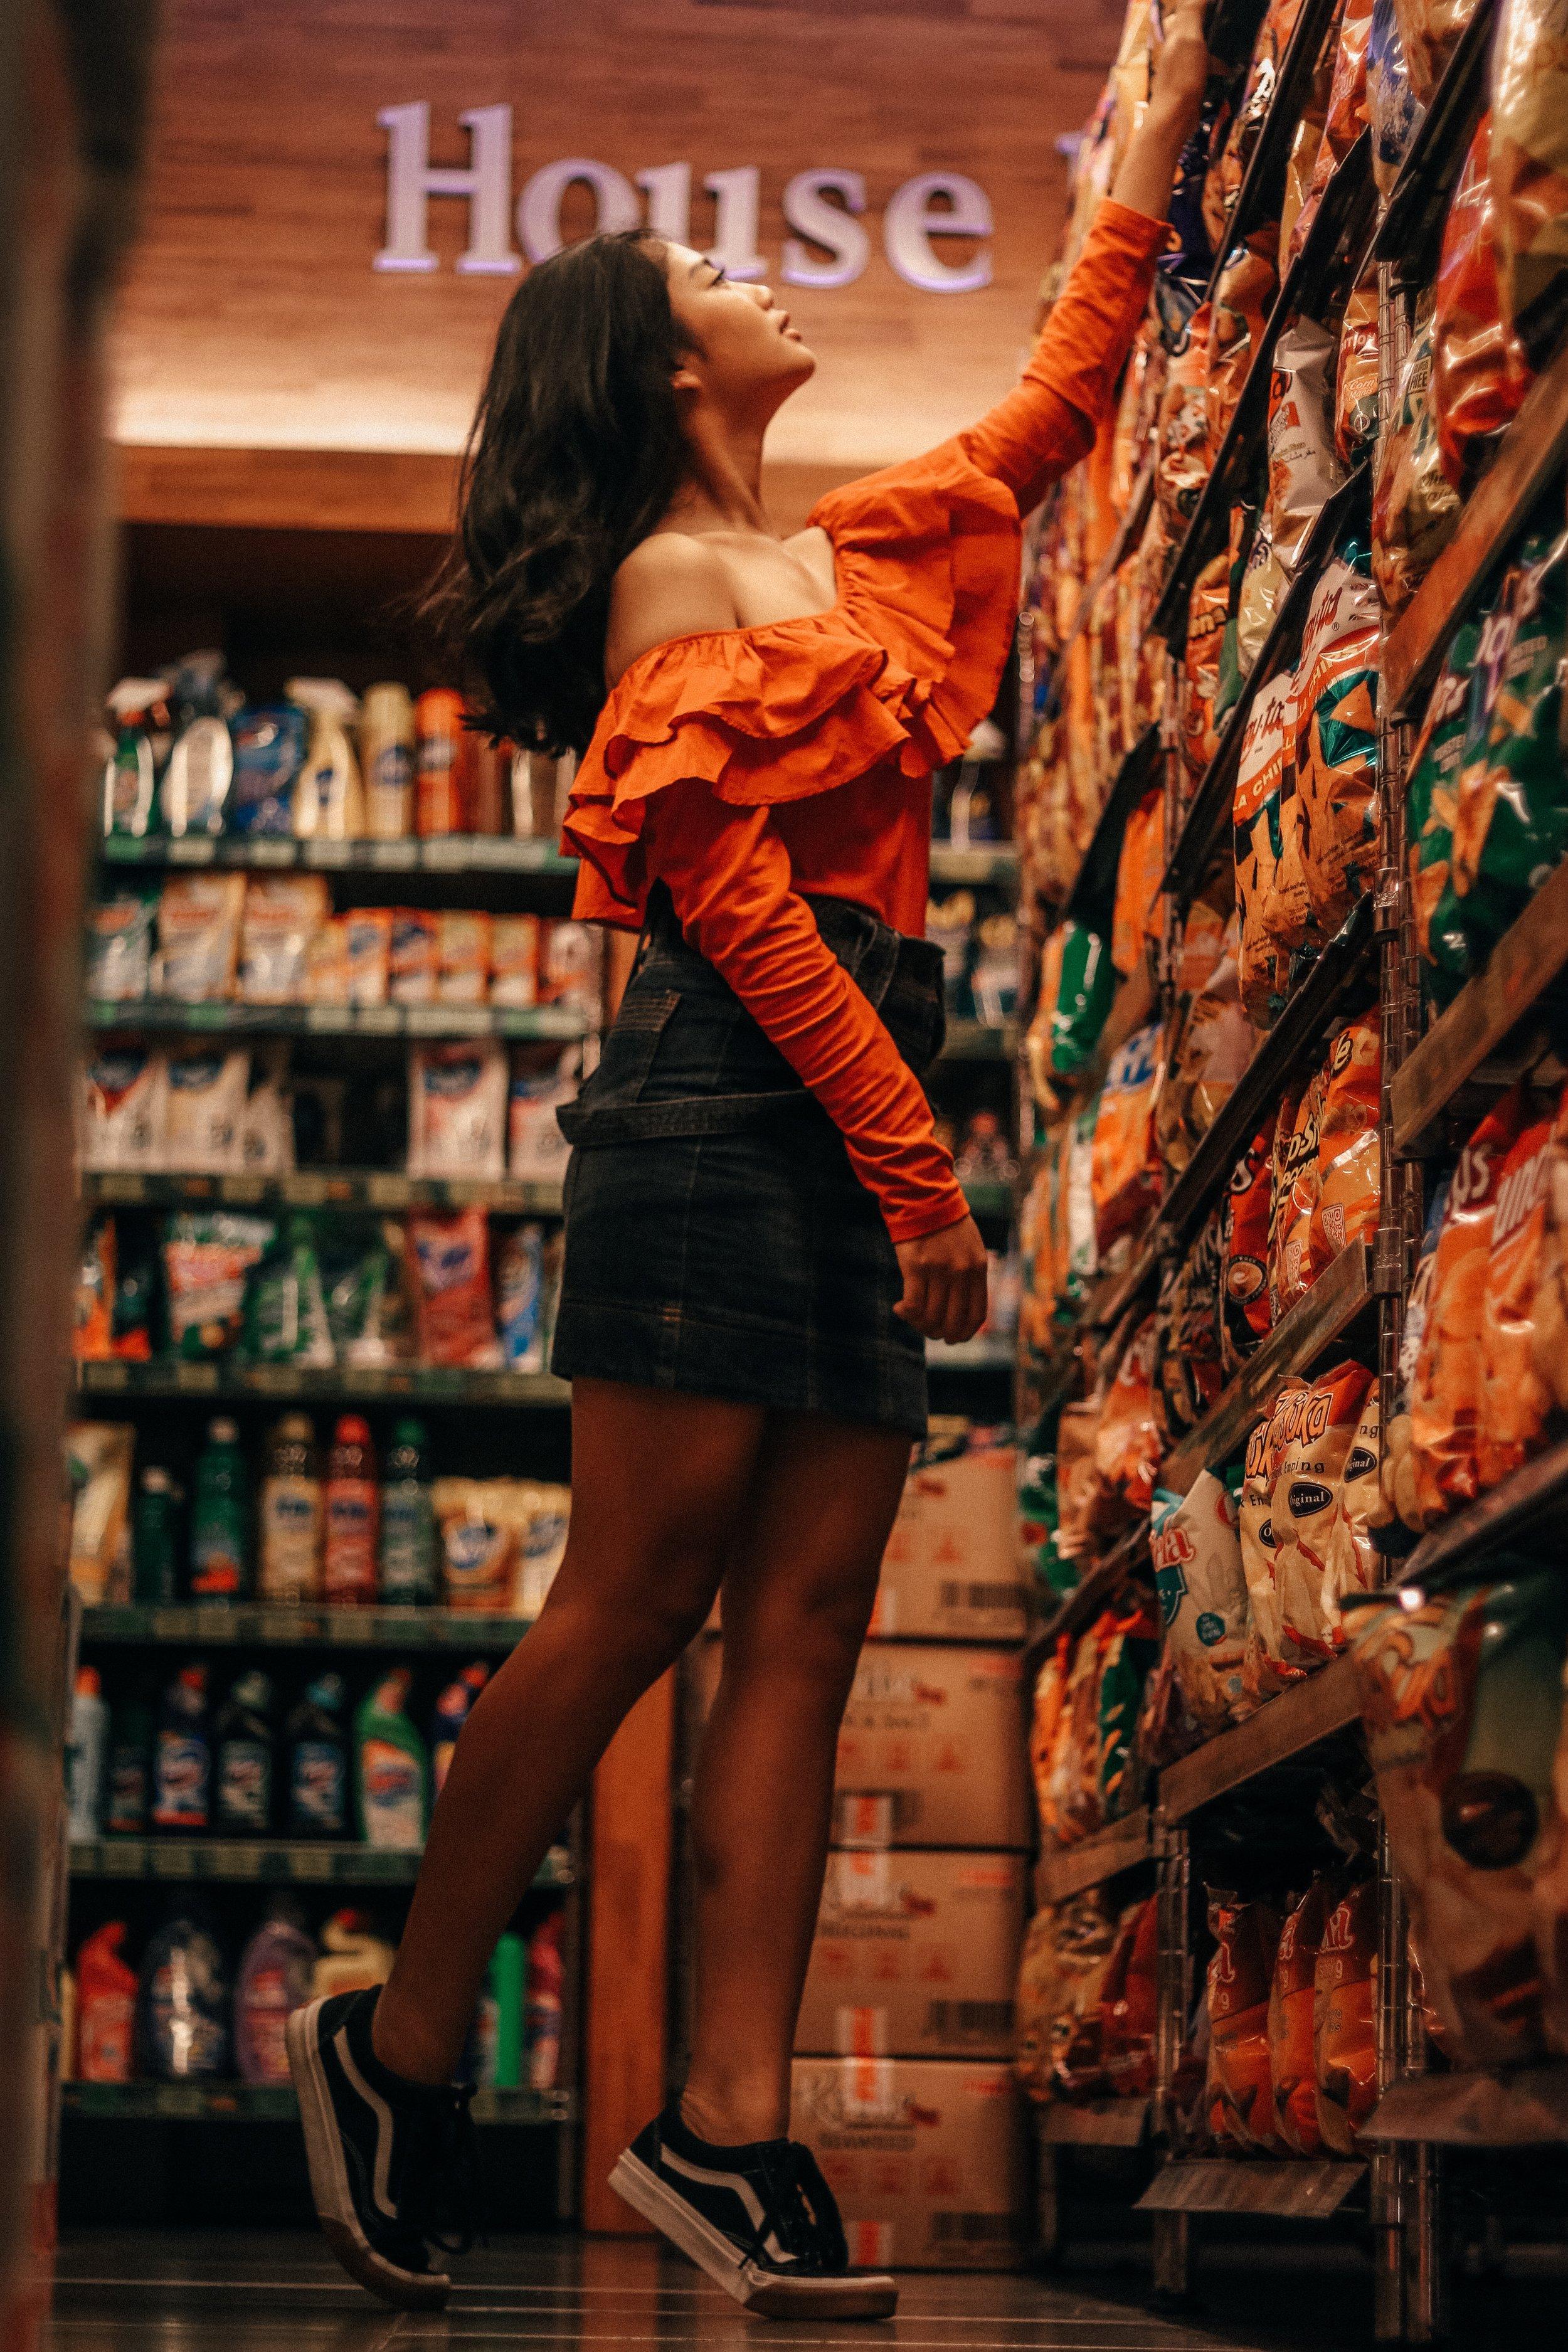 uwm.groceryhacks.chan-605512-unsplash.jpg